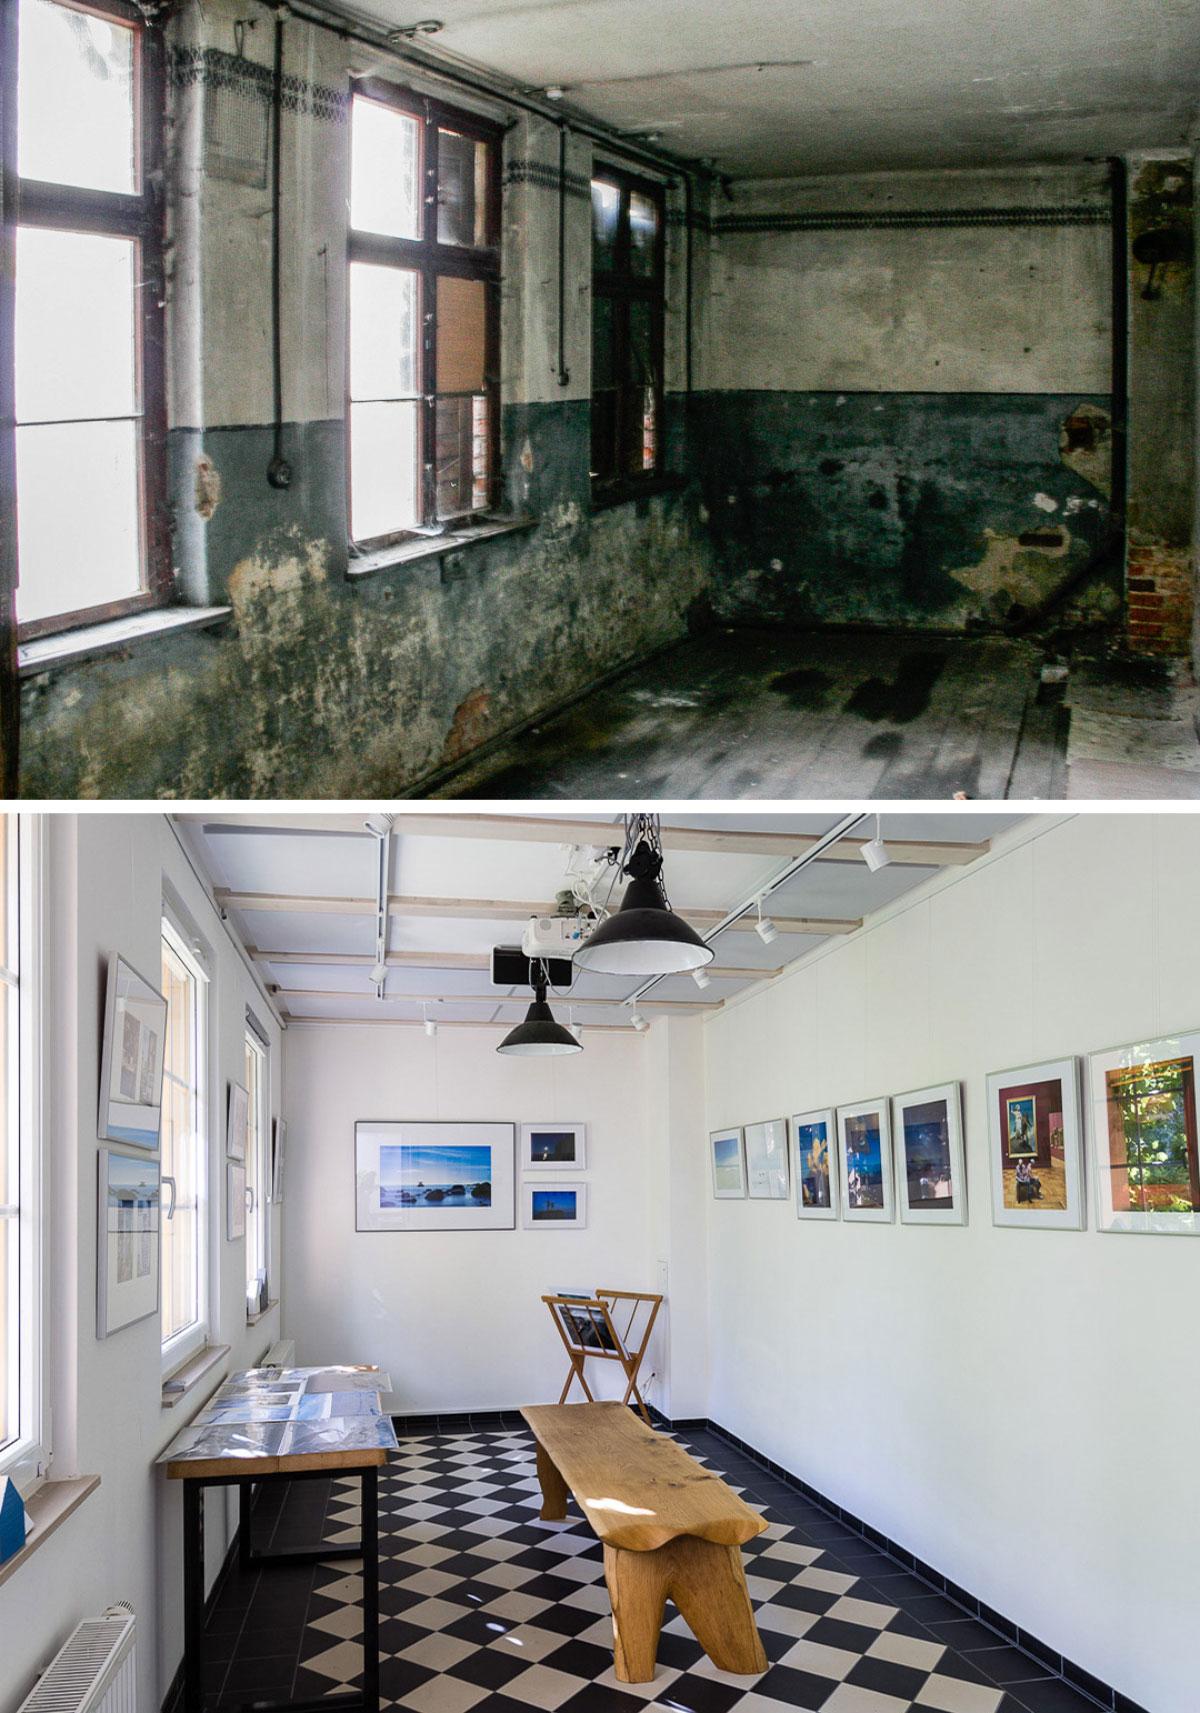 Galerie Remise 56 Strausberg